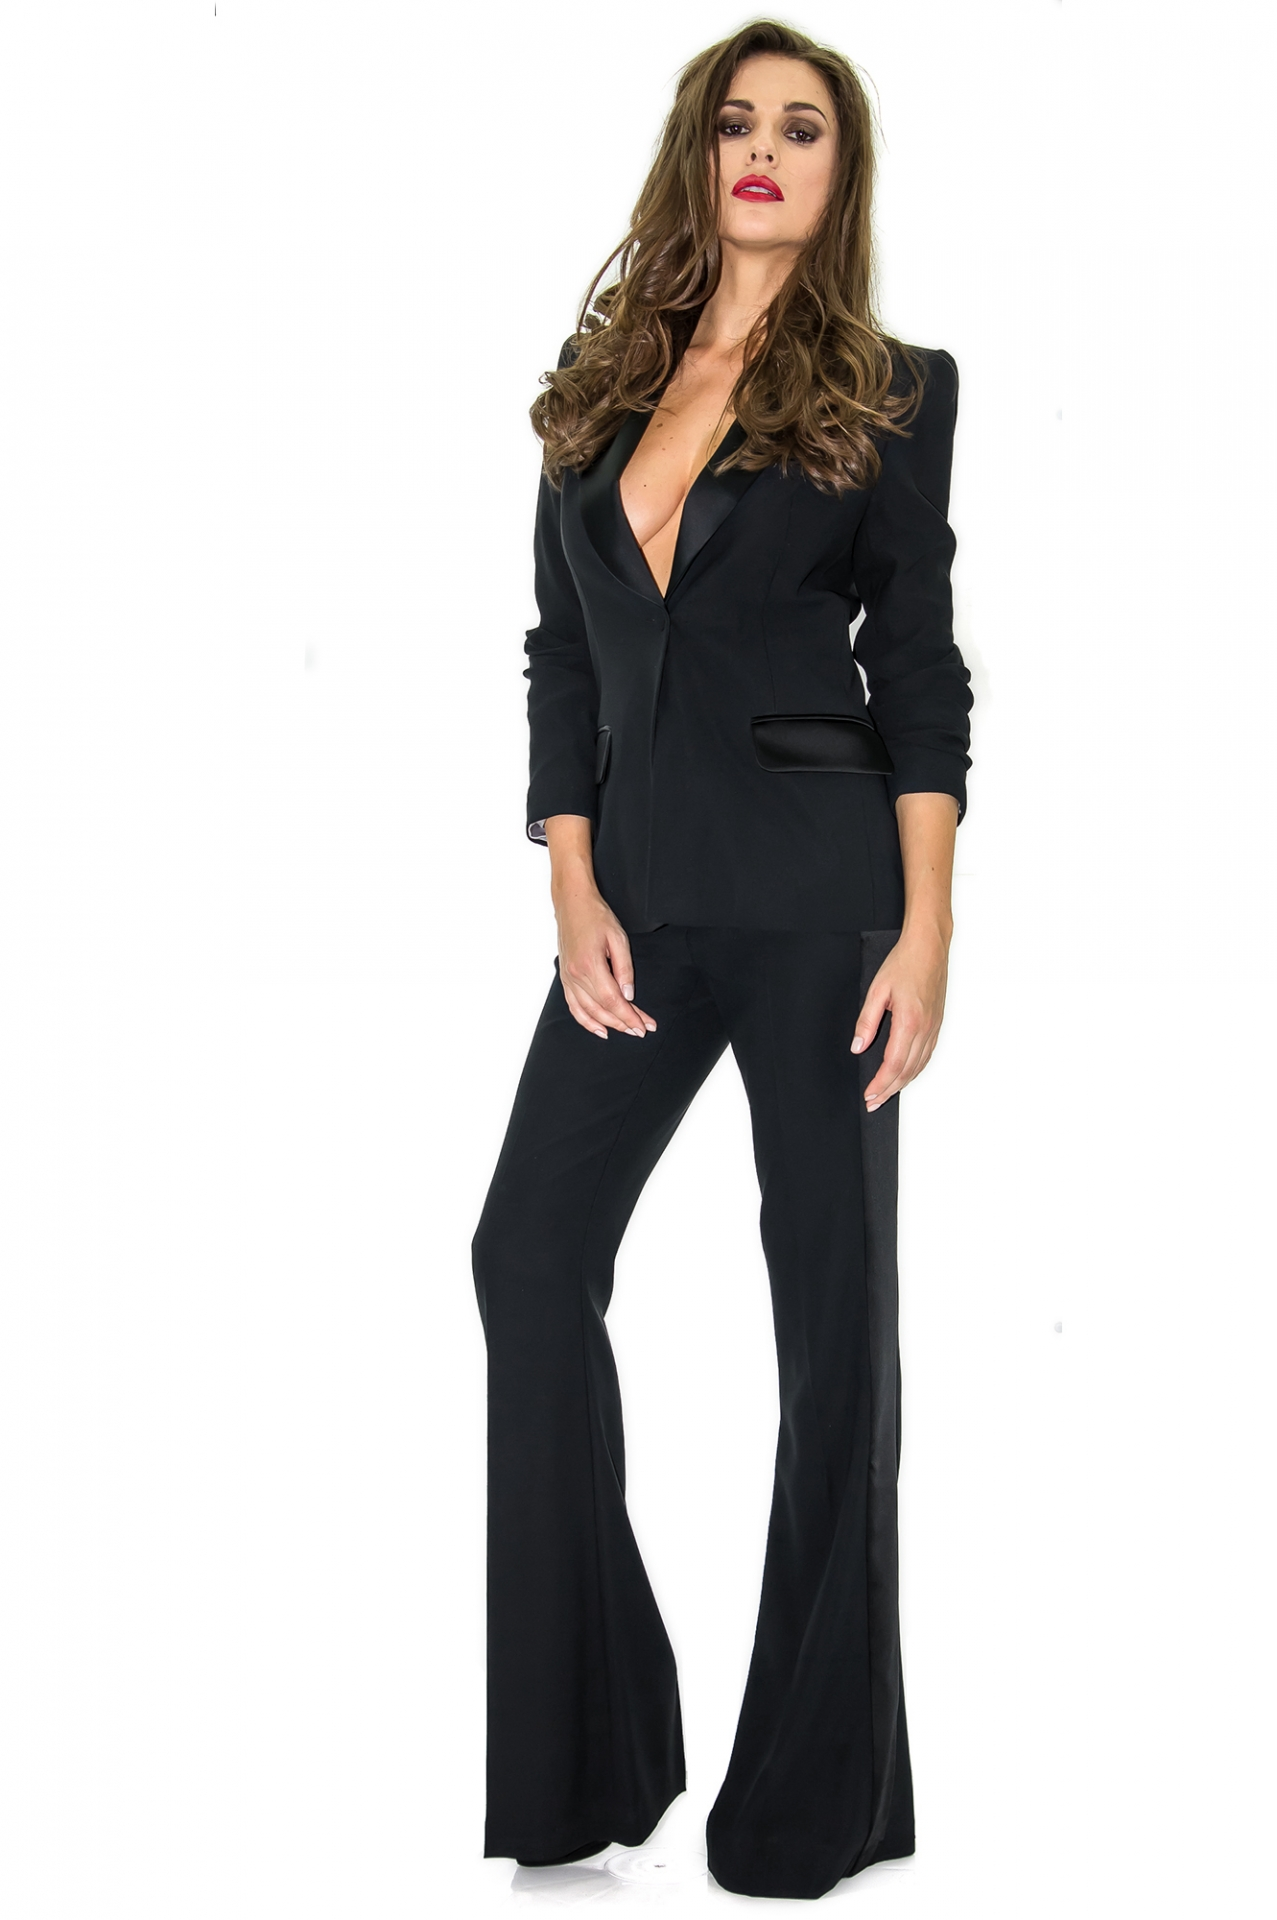 pantalon de smoking femme pantalon habill stefanie. Black Bedroom Furniture Sets. Home Design Ideas